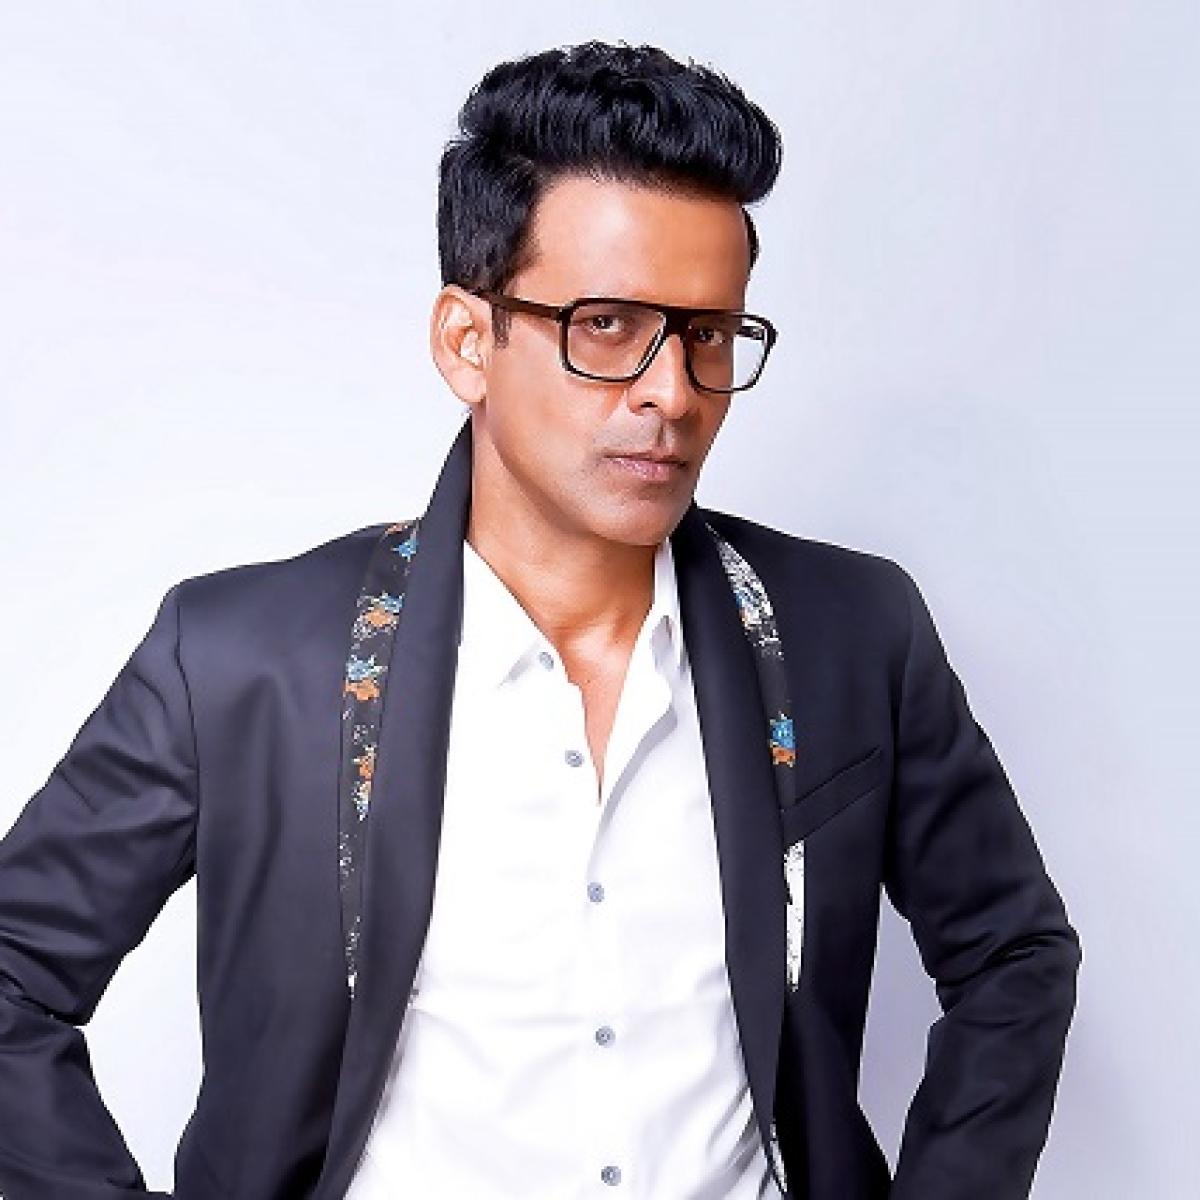 No lockdown blues for Manoj Bajpayee